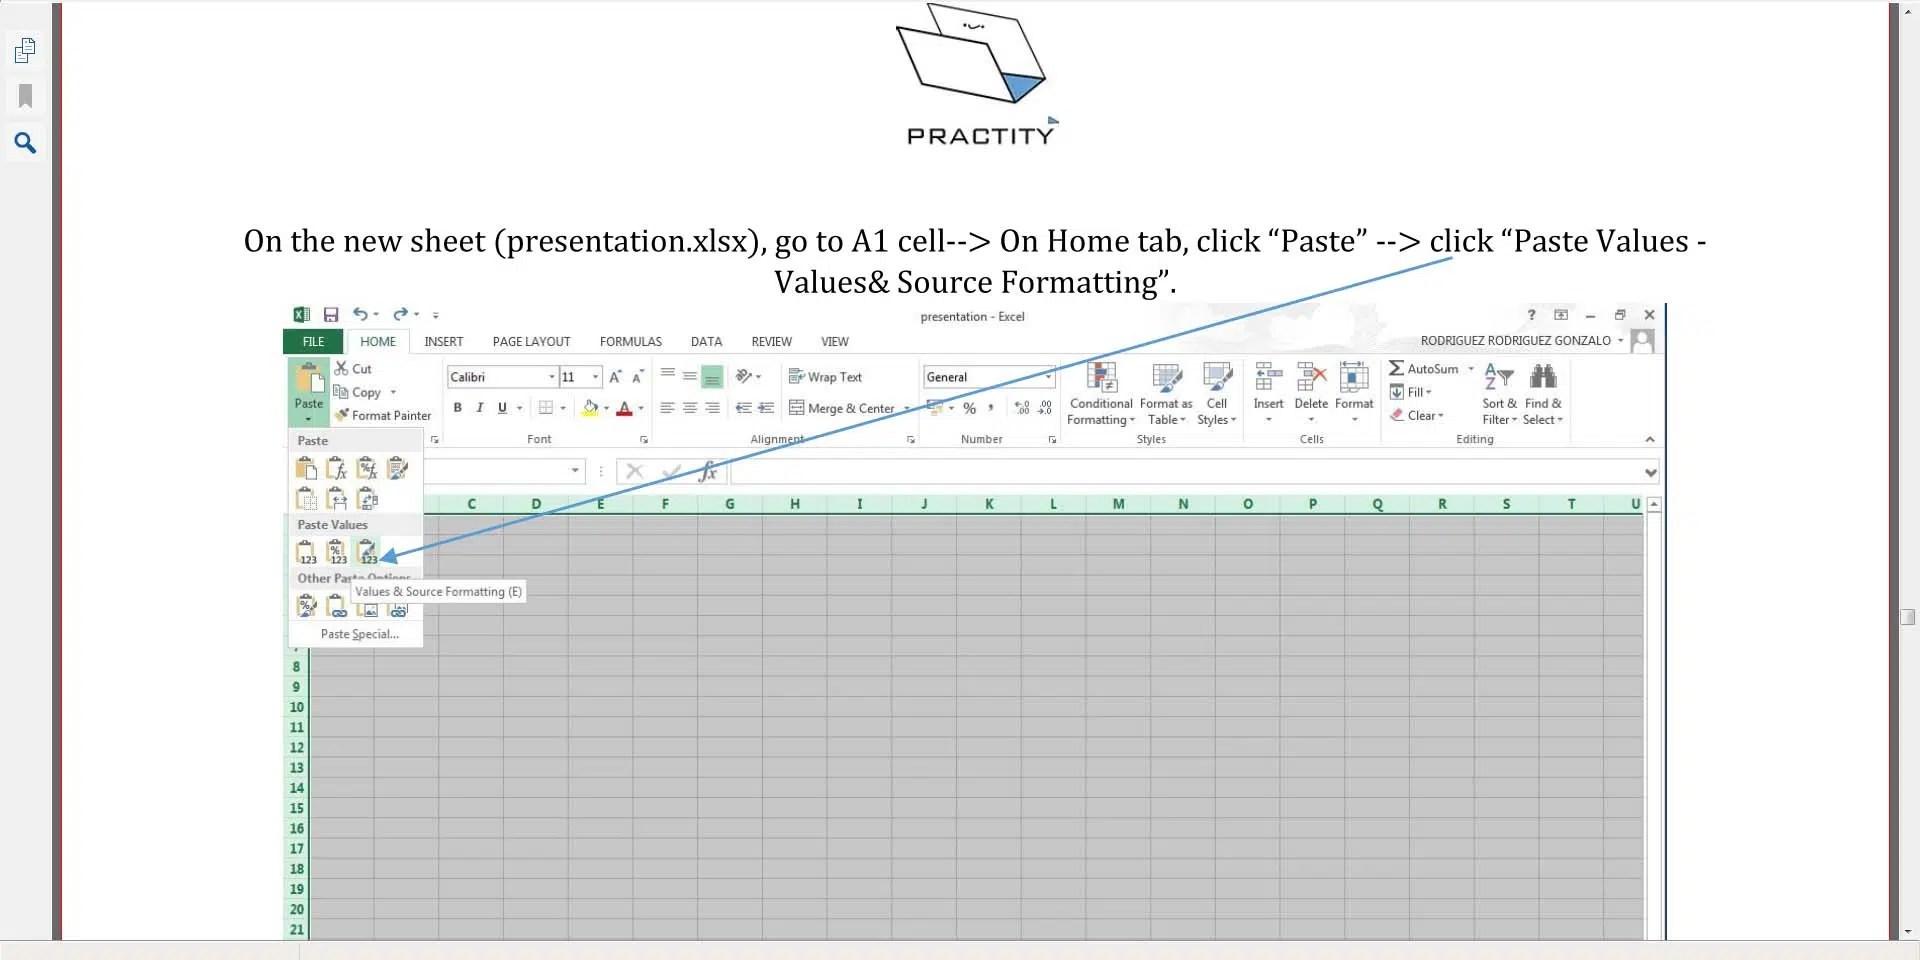 Excel Assignments For Practice Excel Beginners Practity